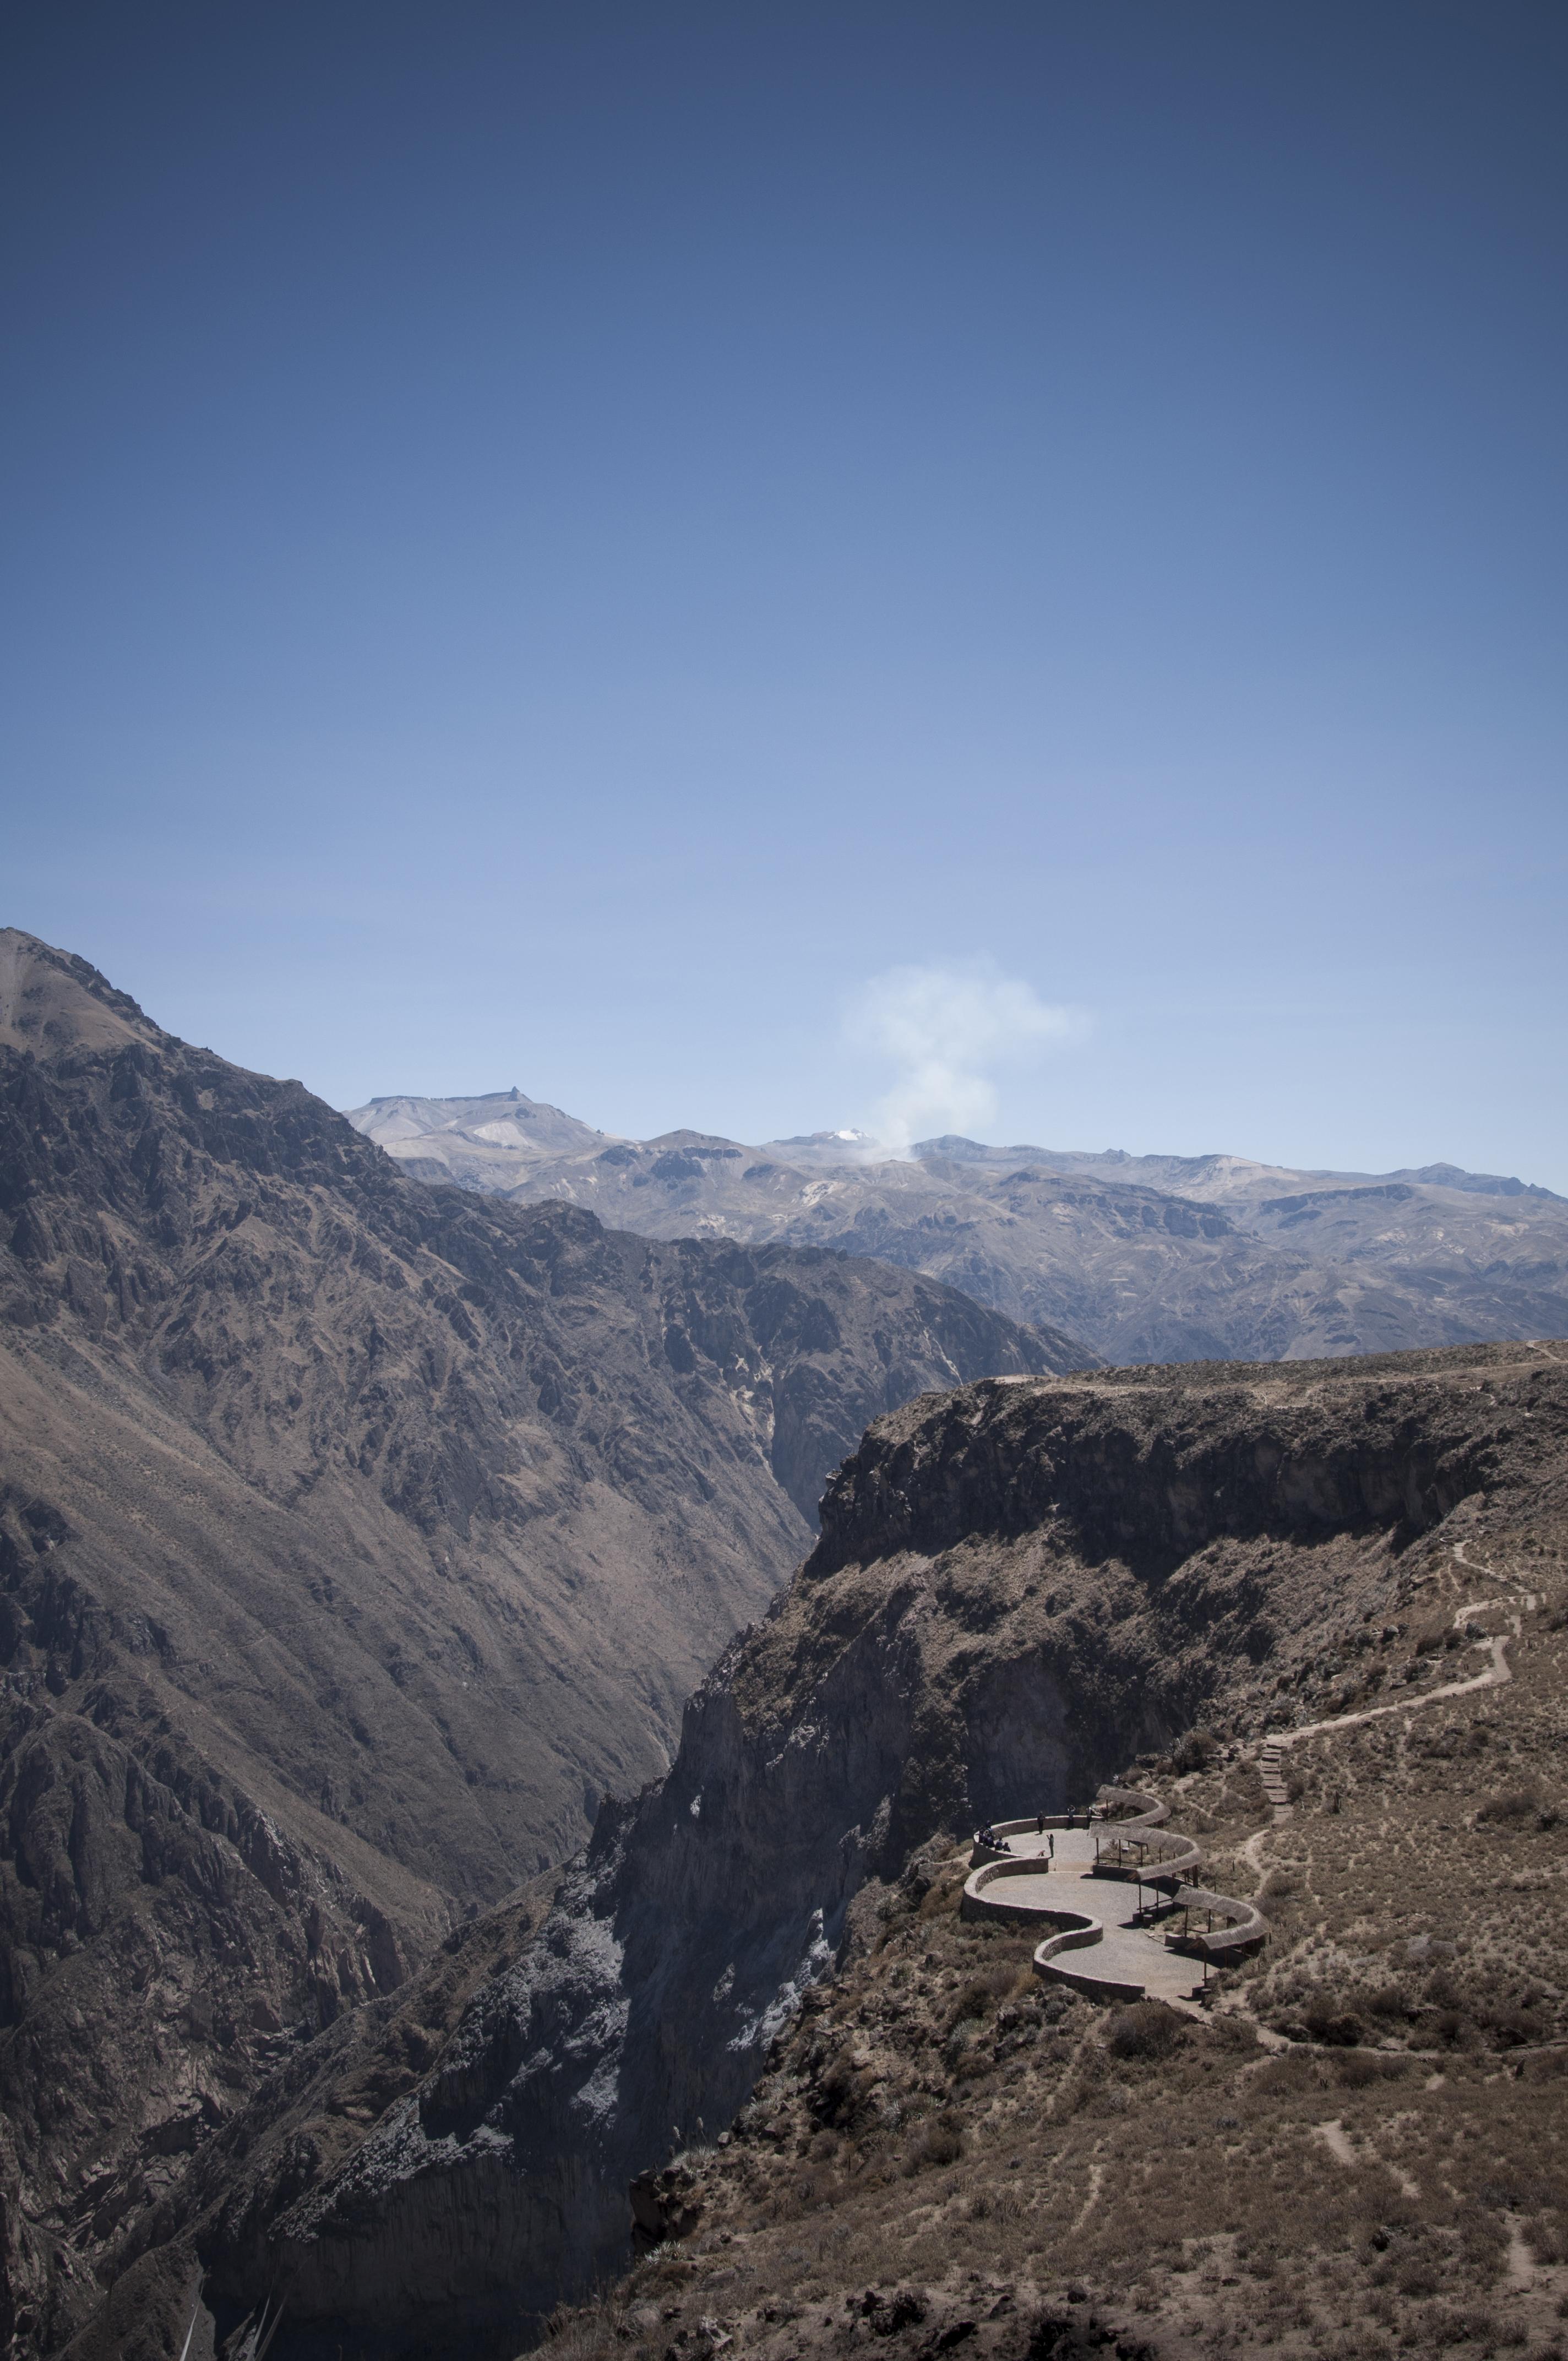 Peru 2013 Cañon del Colca Mirador del condor2